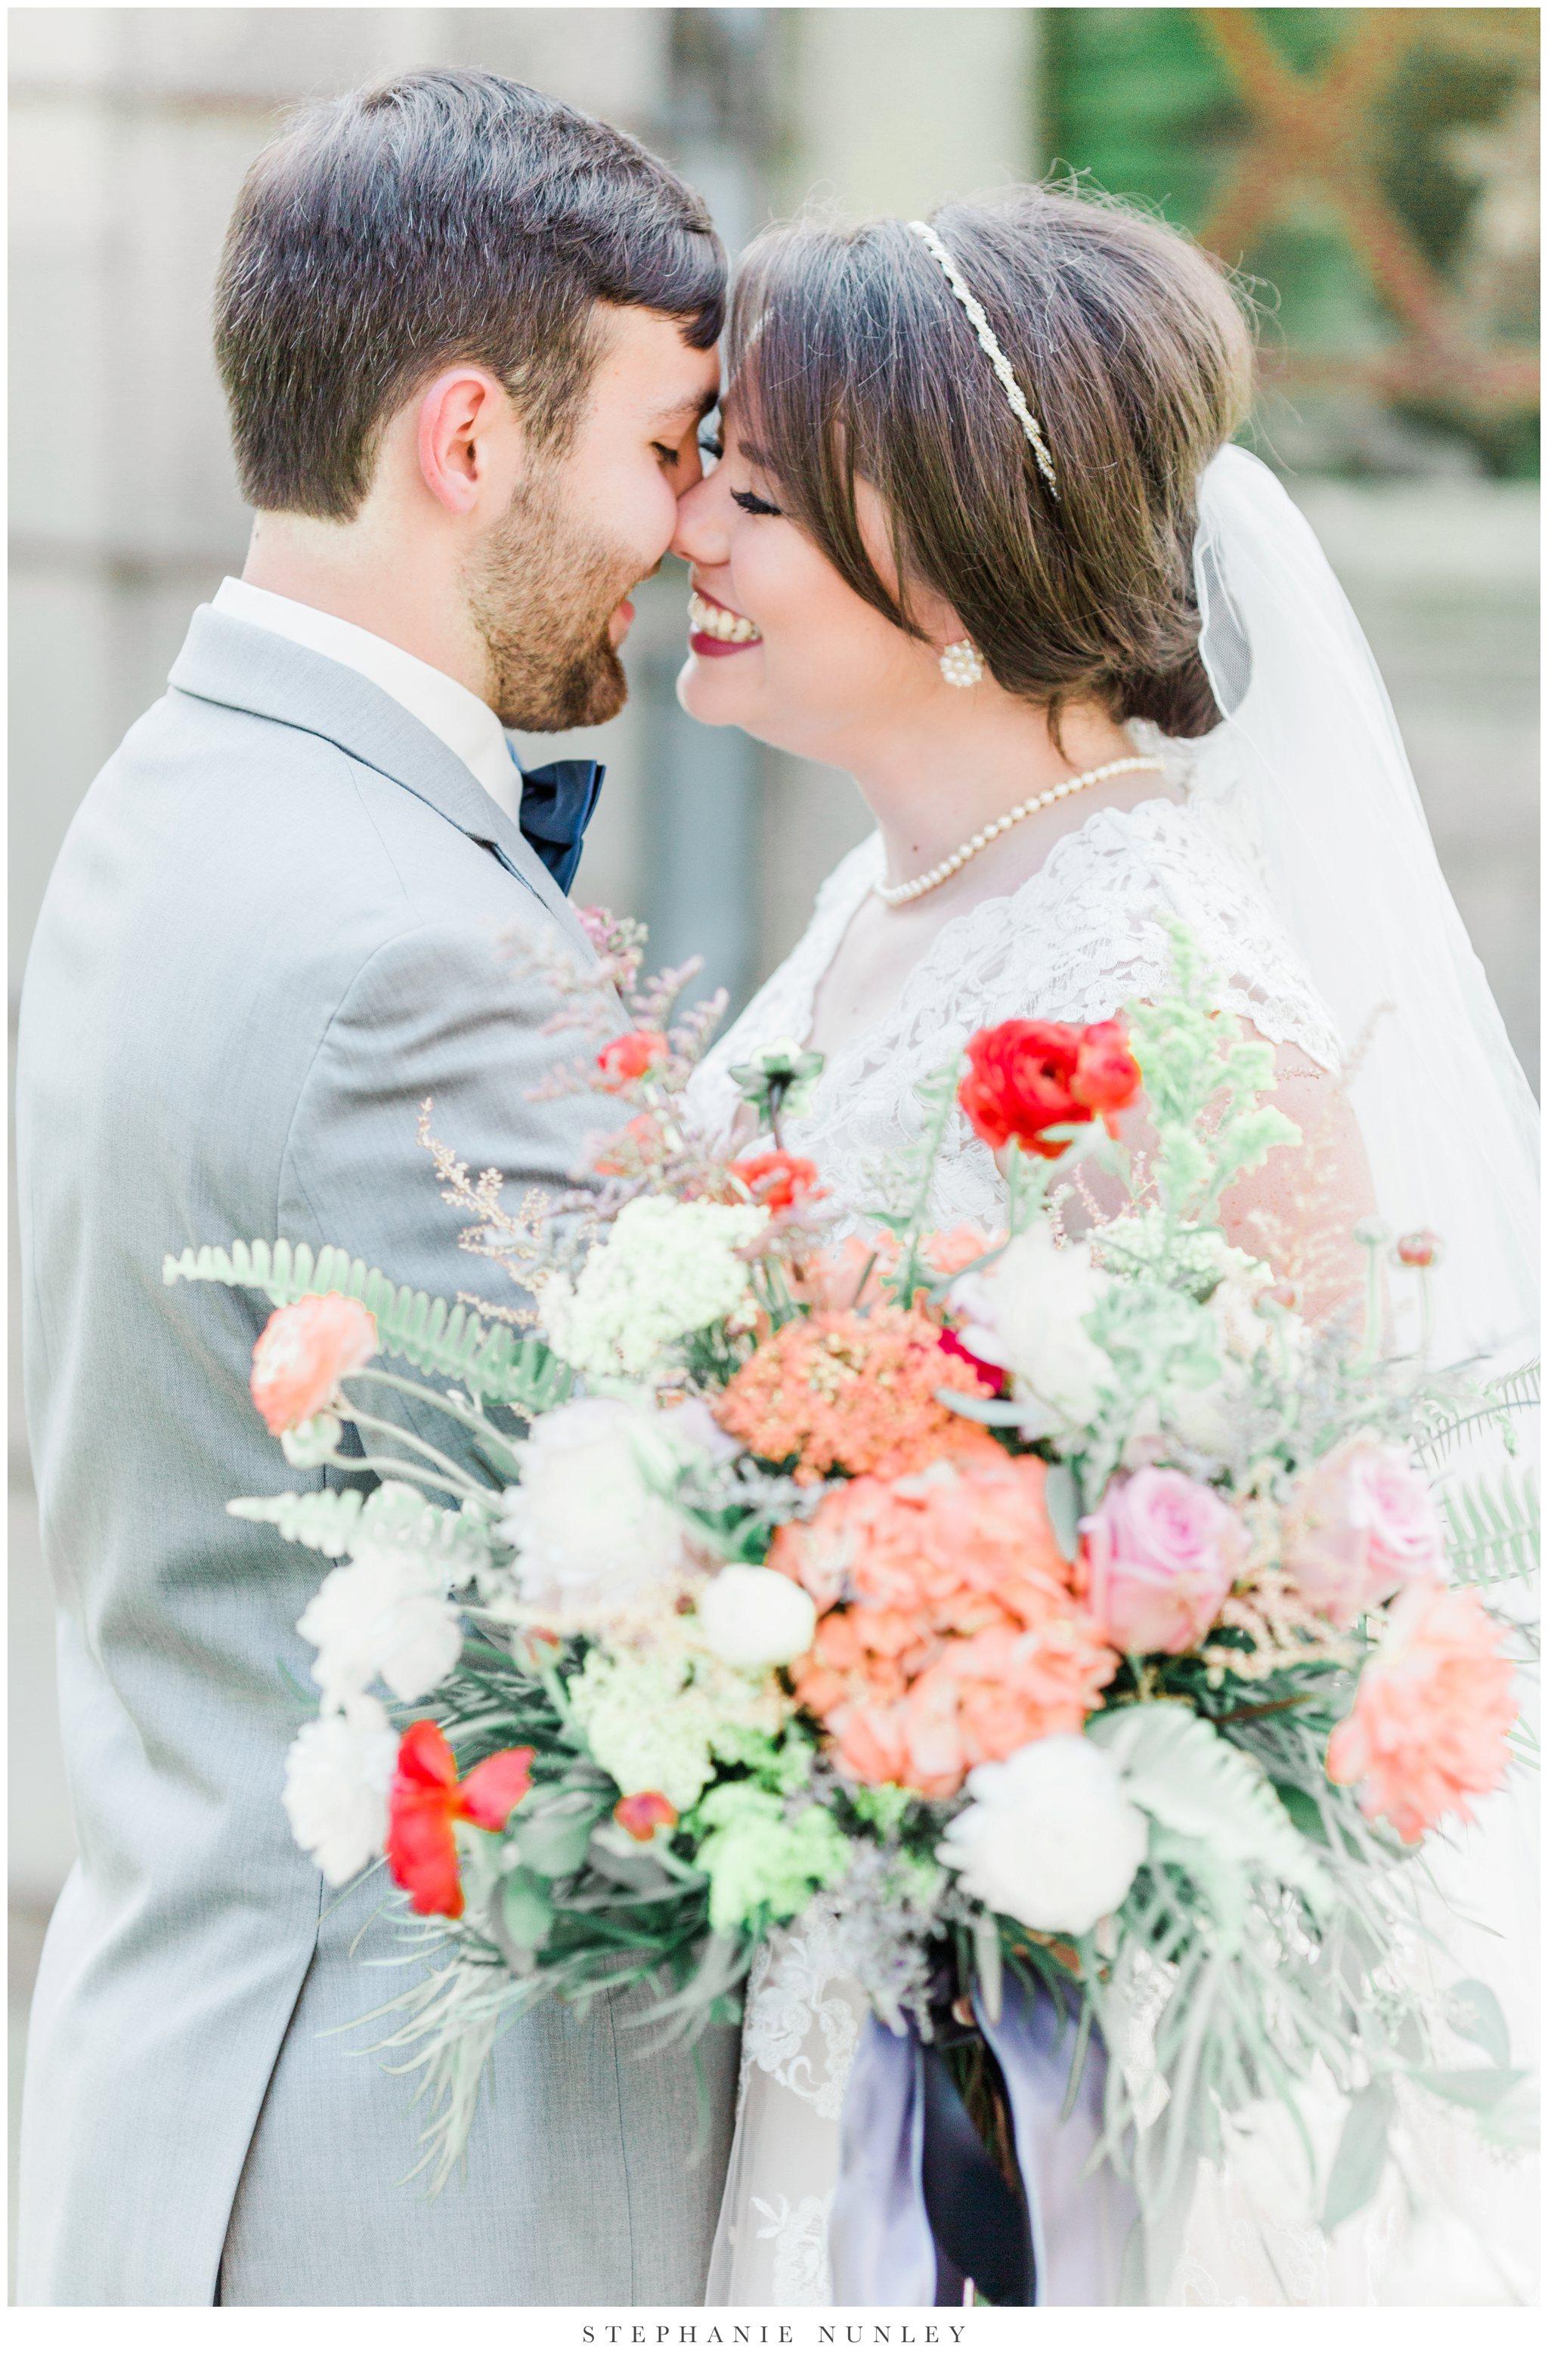 arkansas-wedding-with-lush-wildflower-bouquet-0041.jpg